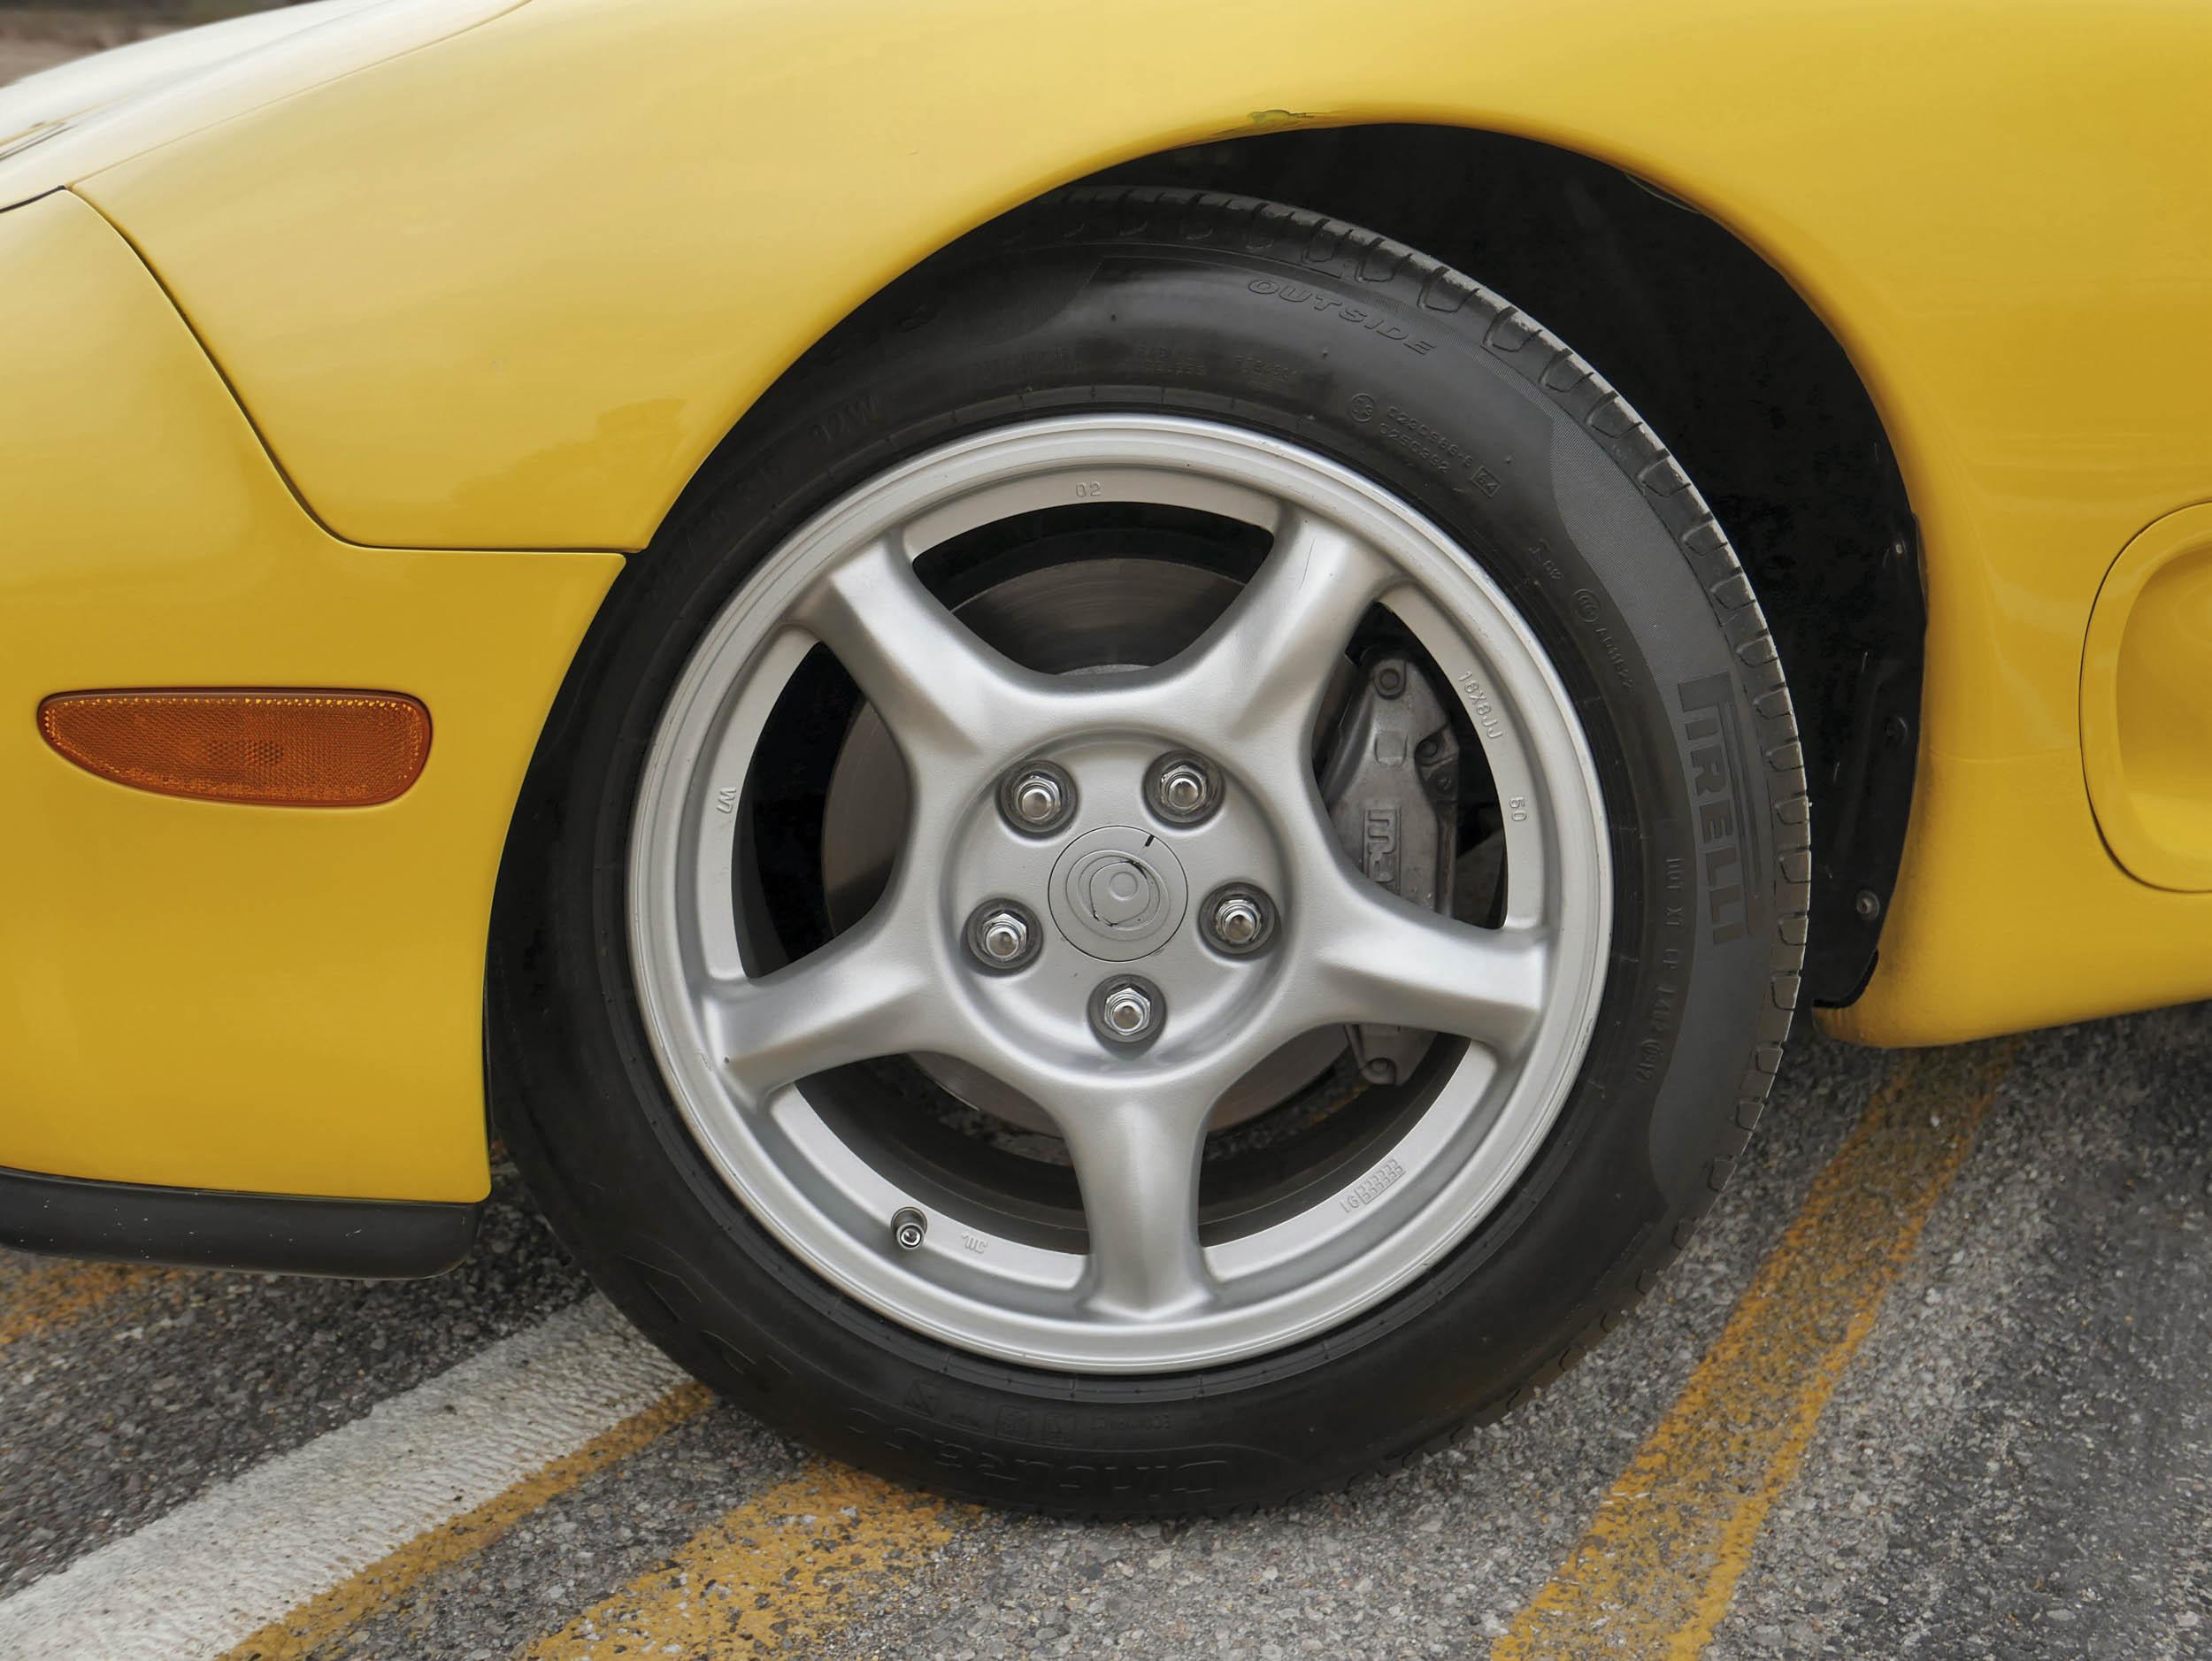 Mazda RX-7 wheel detail